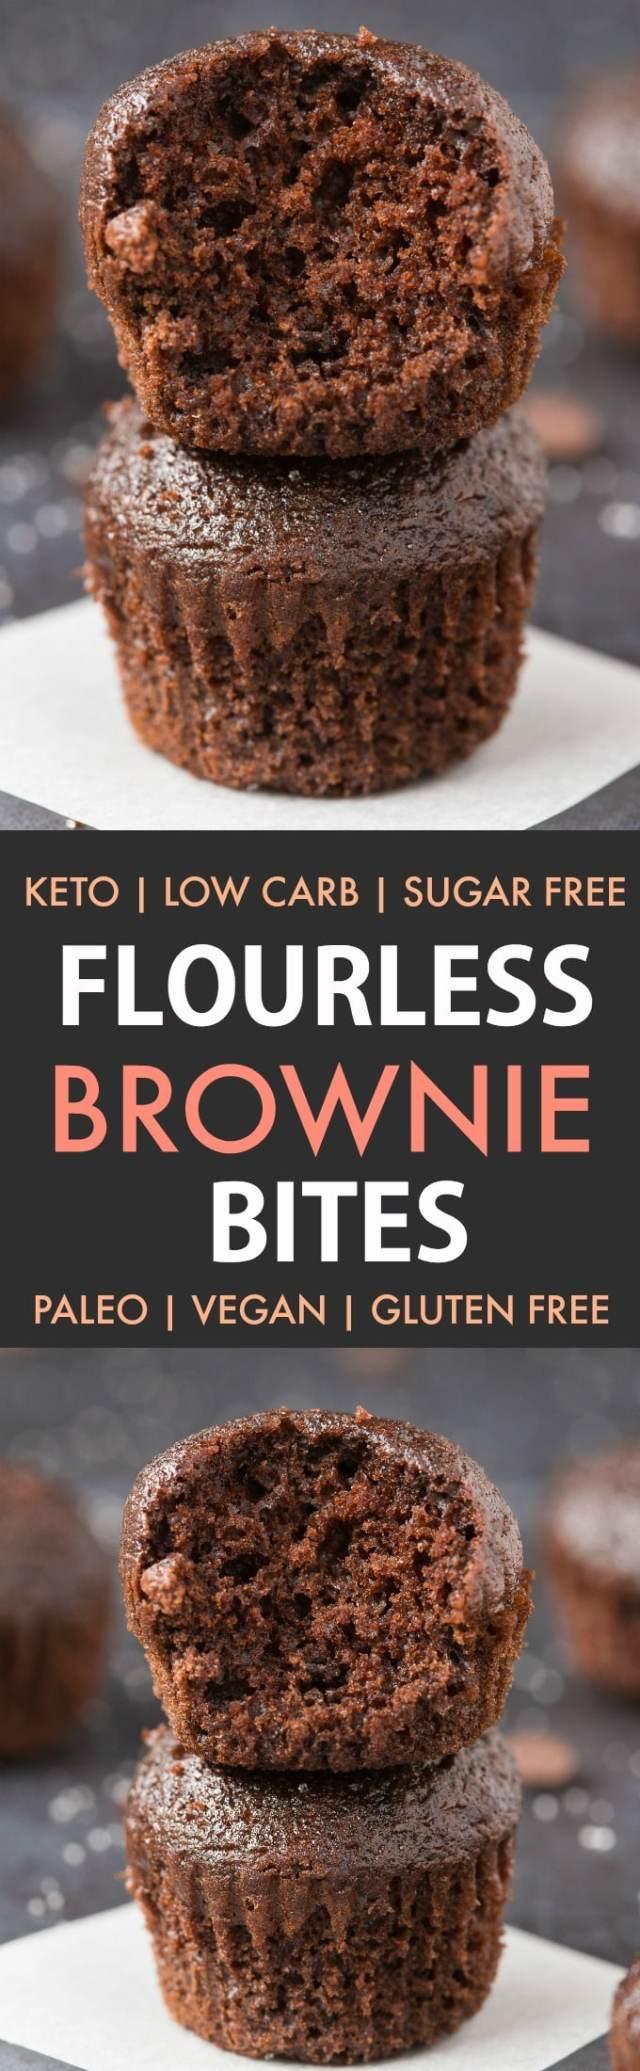 Healthy Flourless Paleo Vegan Brownie Bites in a collage